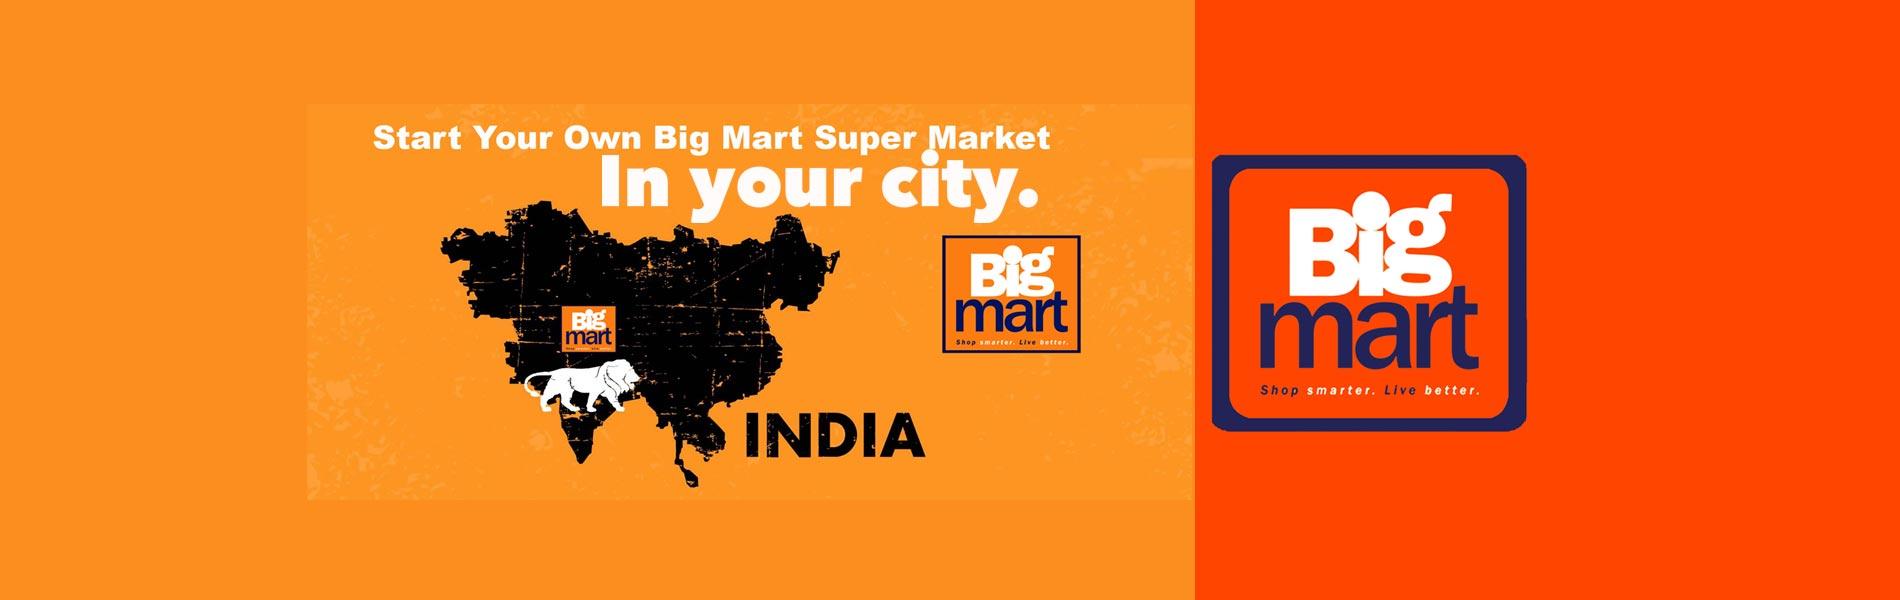 Big Mart Retail Corporation - No.1 Grocery SuperMarket